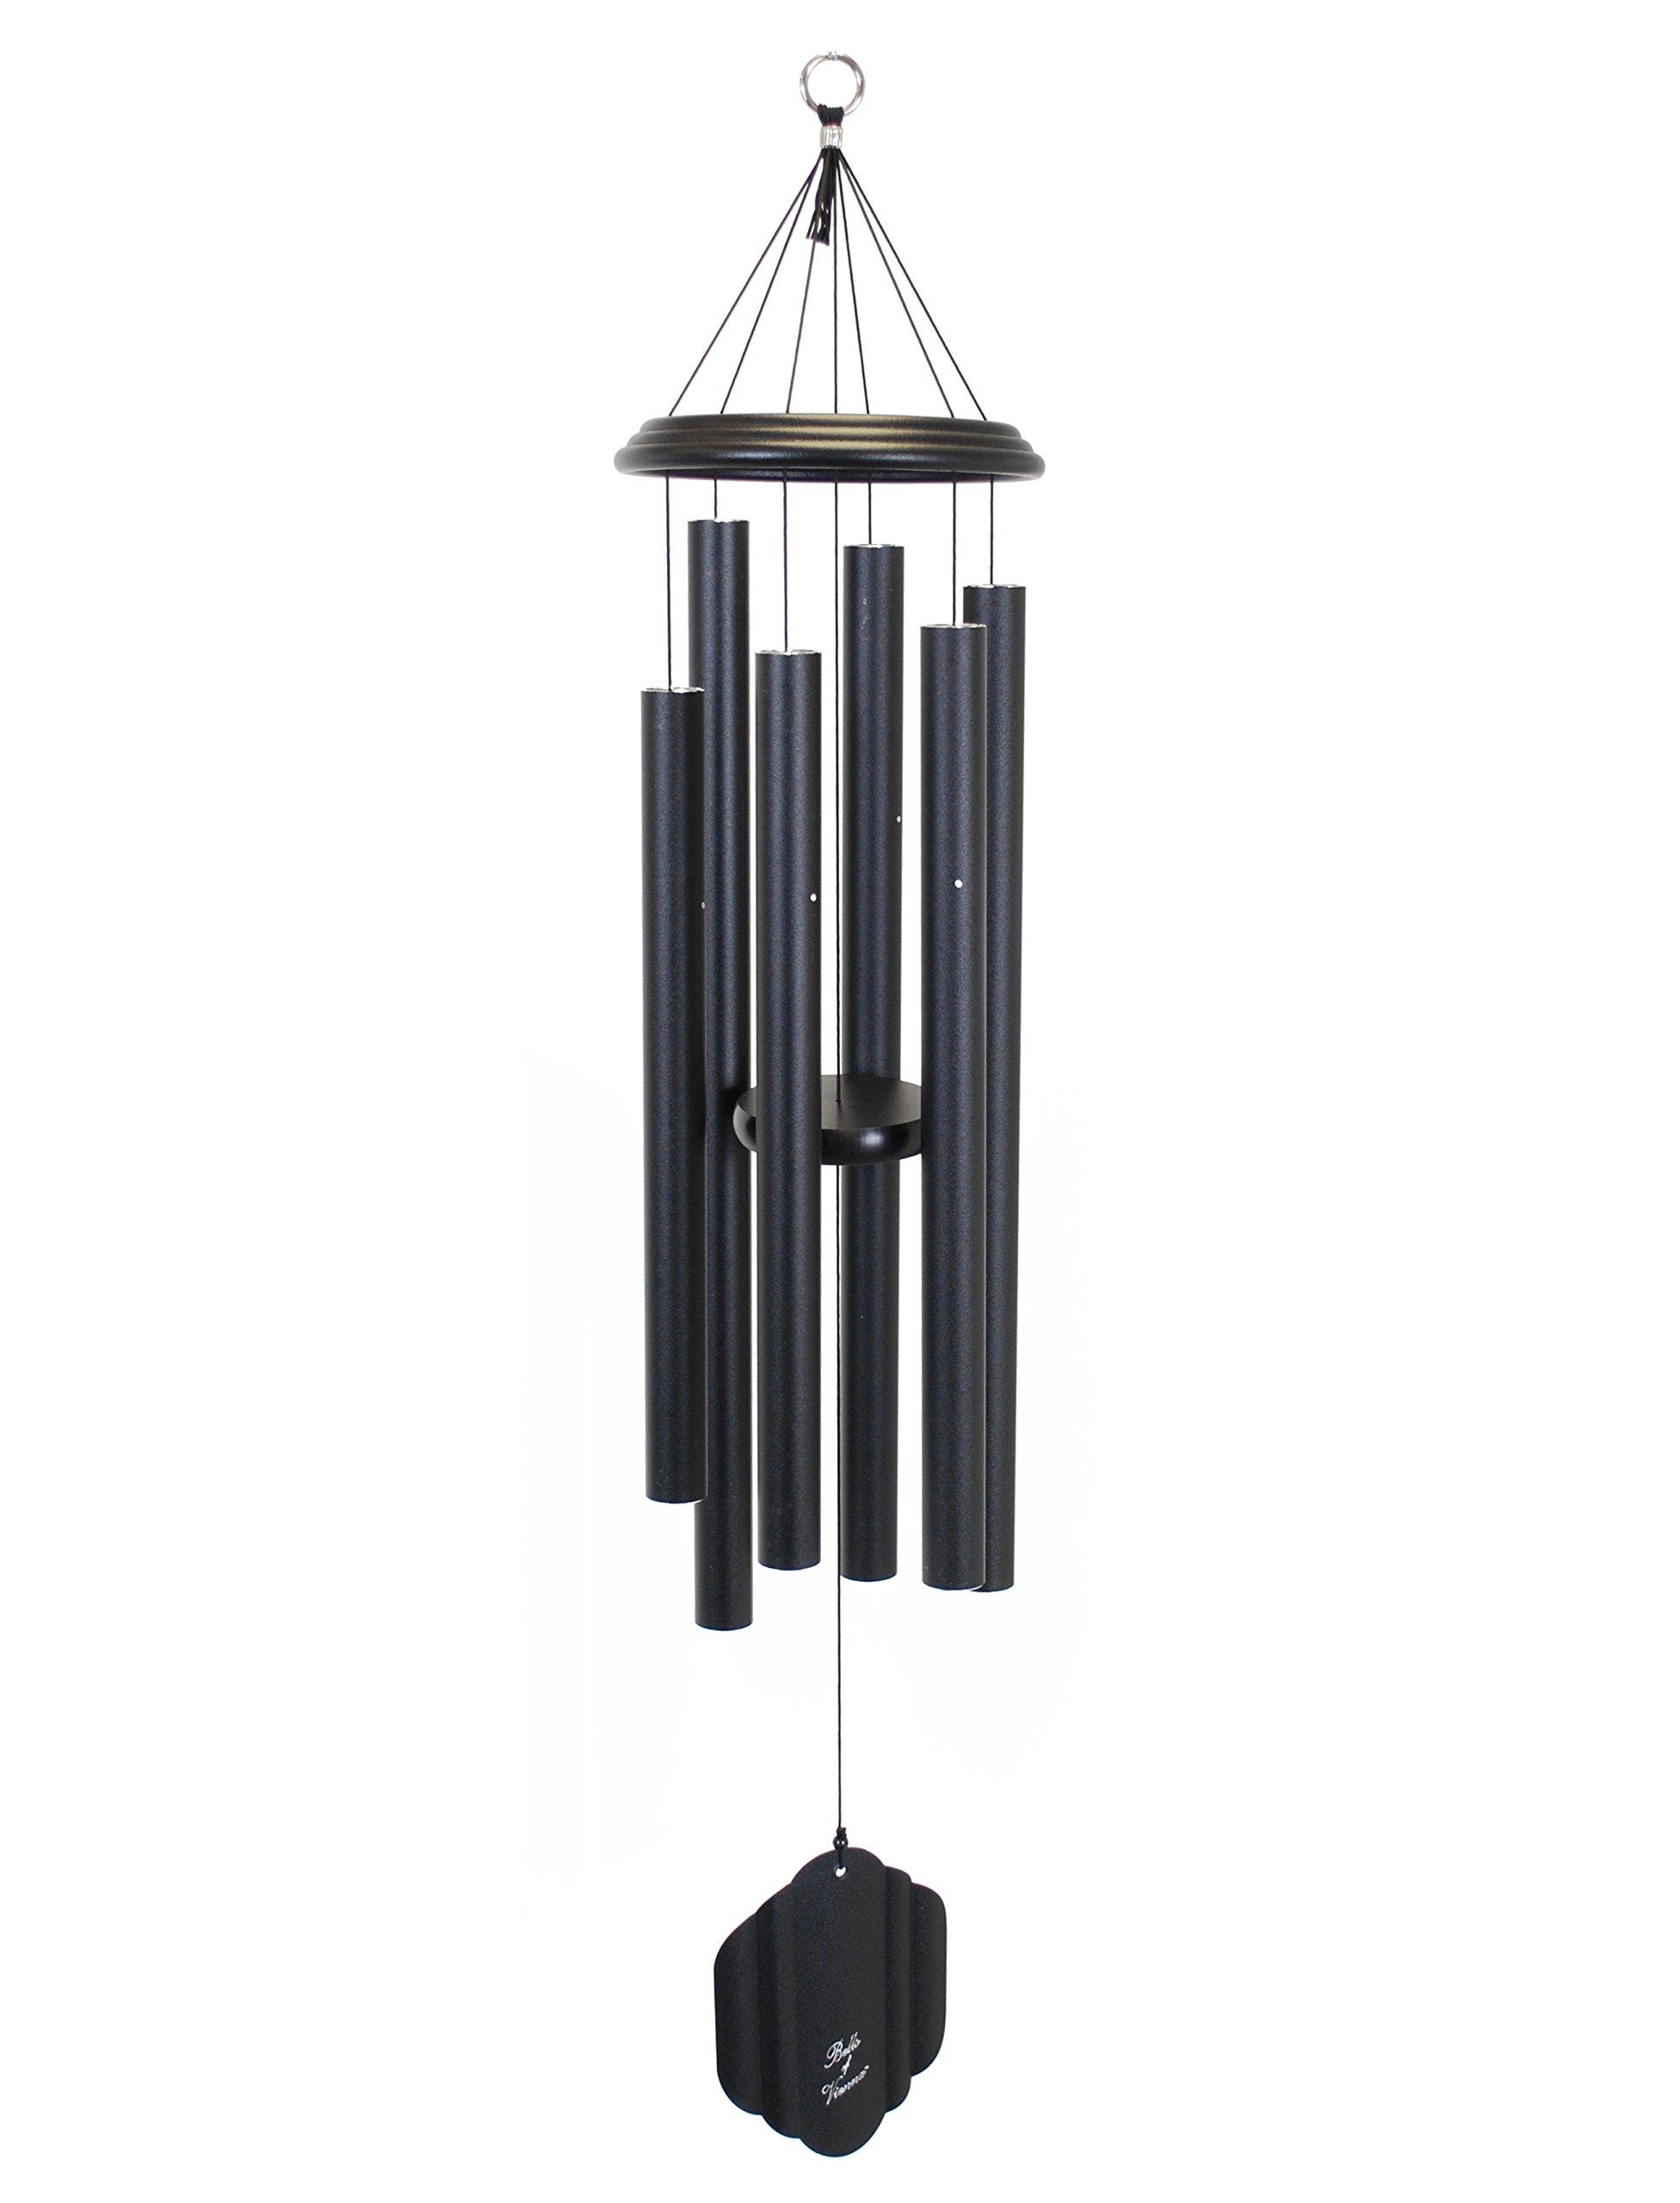 Bells of Vienna 44-inch Windchime, Black